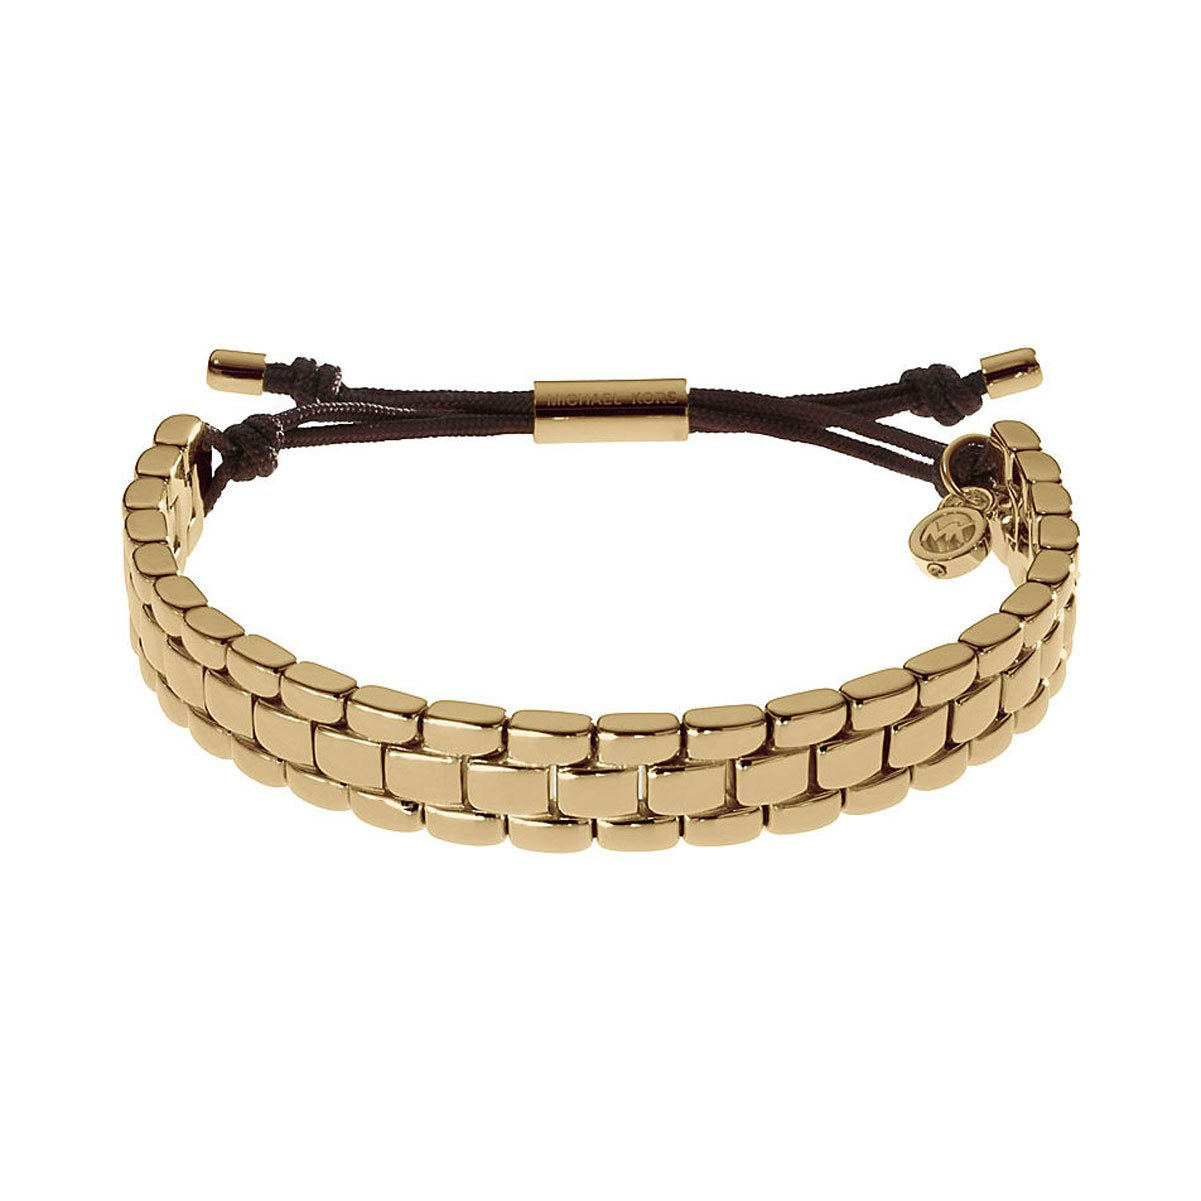 Michael Kors Damen Armband Stoff Edelstahl IP Gold